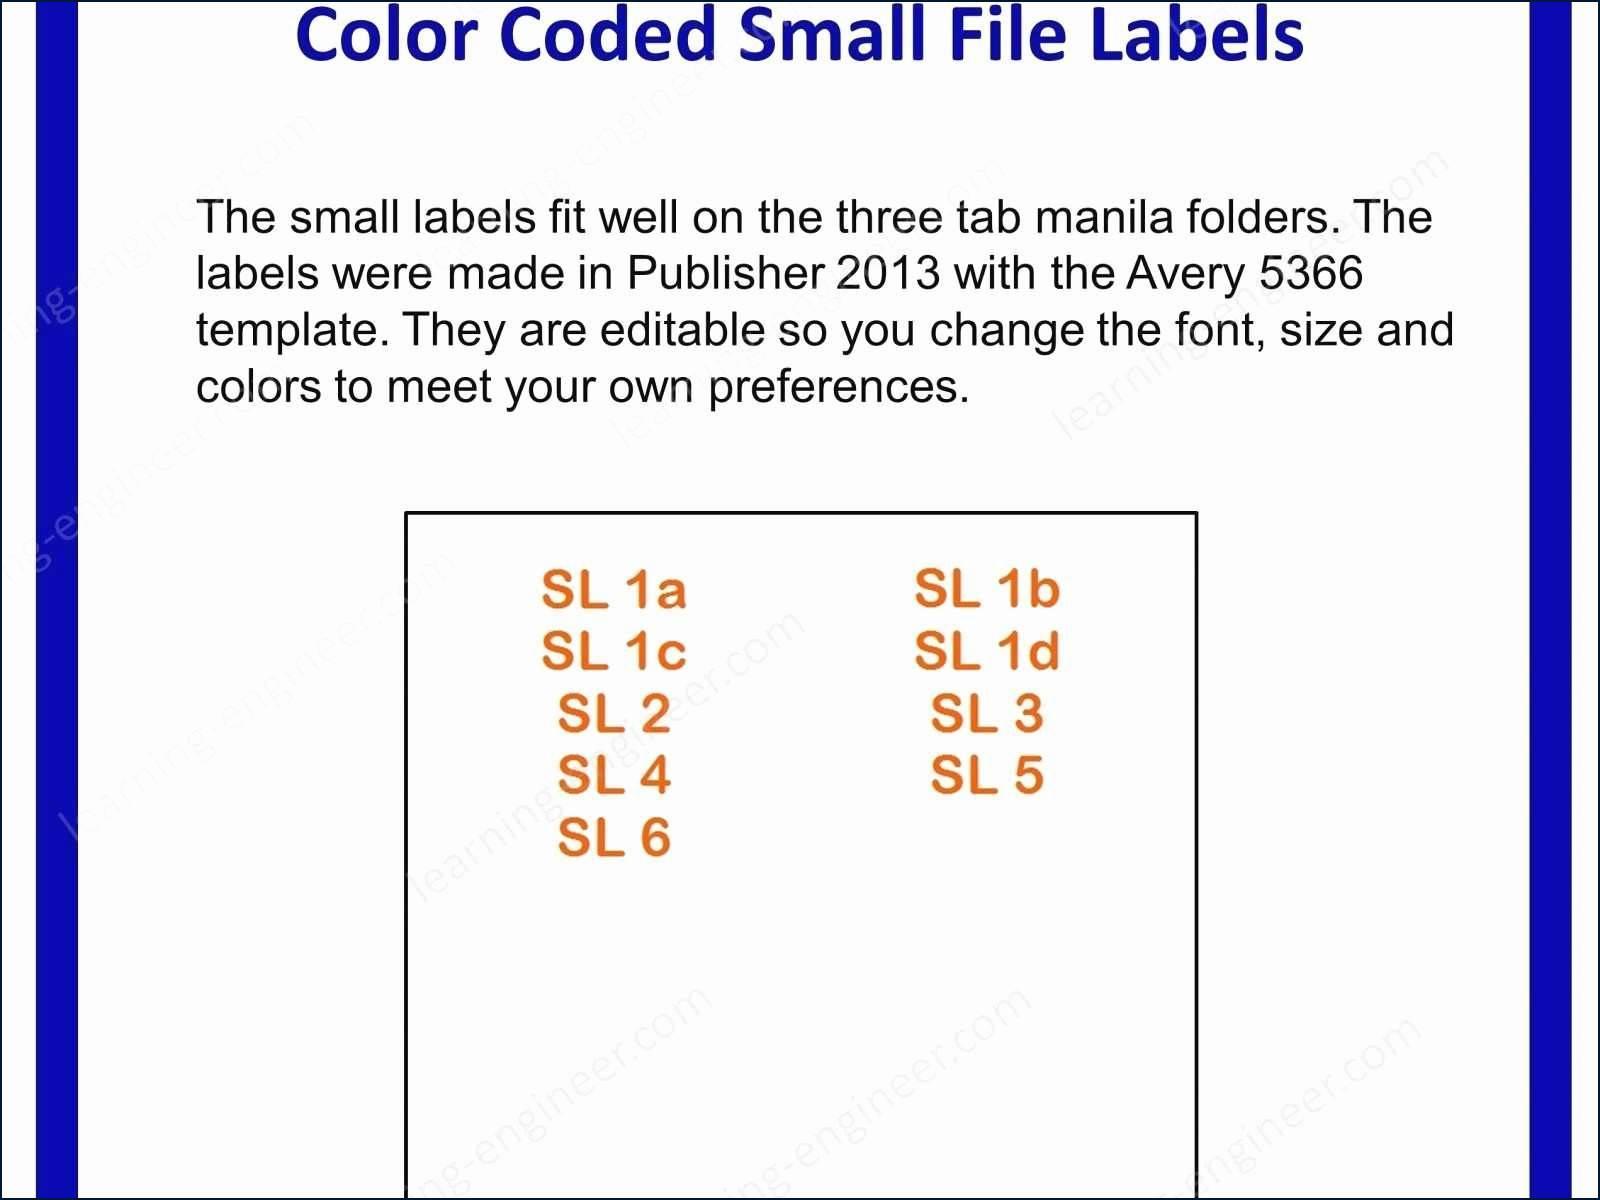 Avery File Folder Label Templates 5366 - Templates #39570